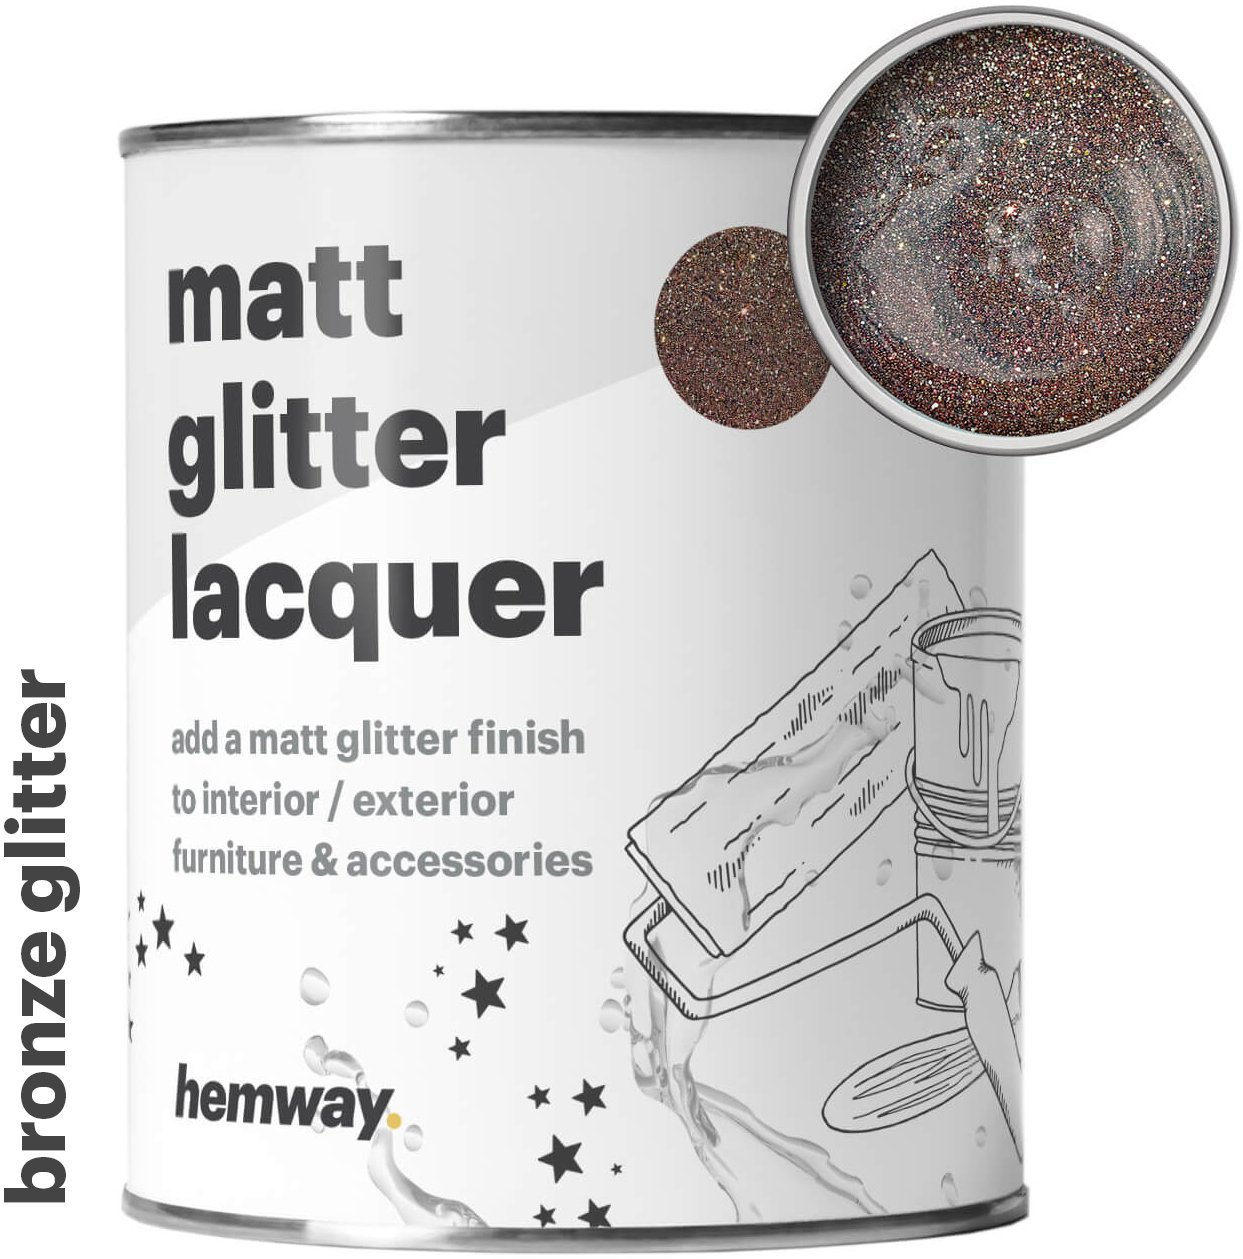 Hemway Bronze Glitter Matt Varnish Lacquer Quick Dry Sparkling Glaze Interior Exterior, Furniture, Accessories, Brick, Wood, Stone, Plaster, Plastic, Tiles (1 Litre/Quart)